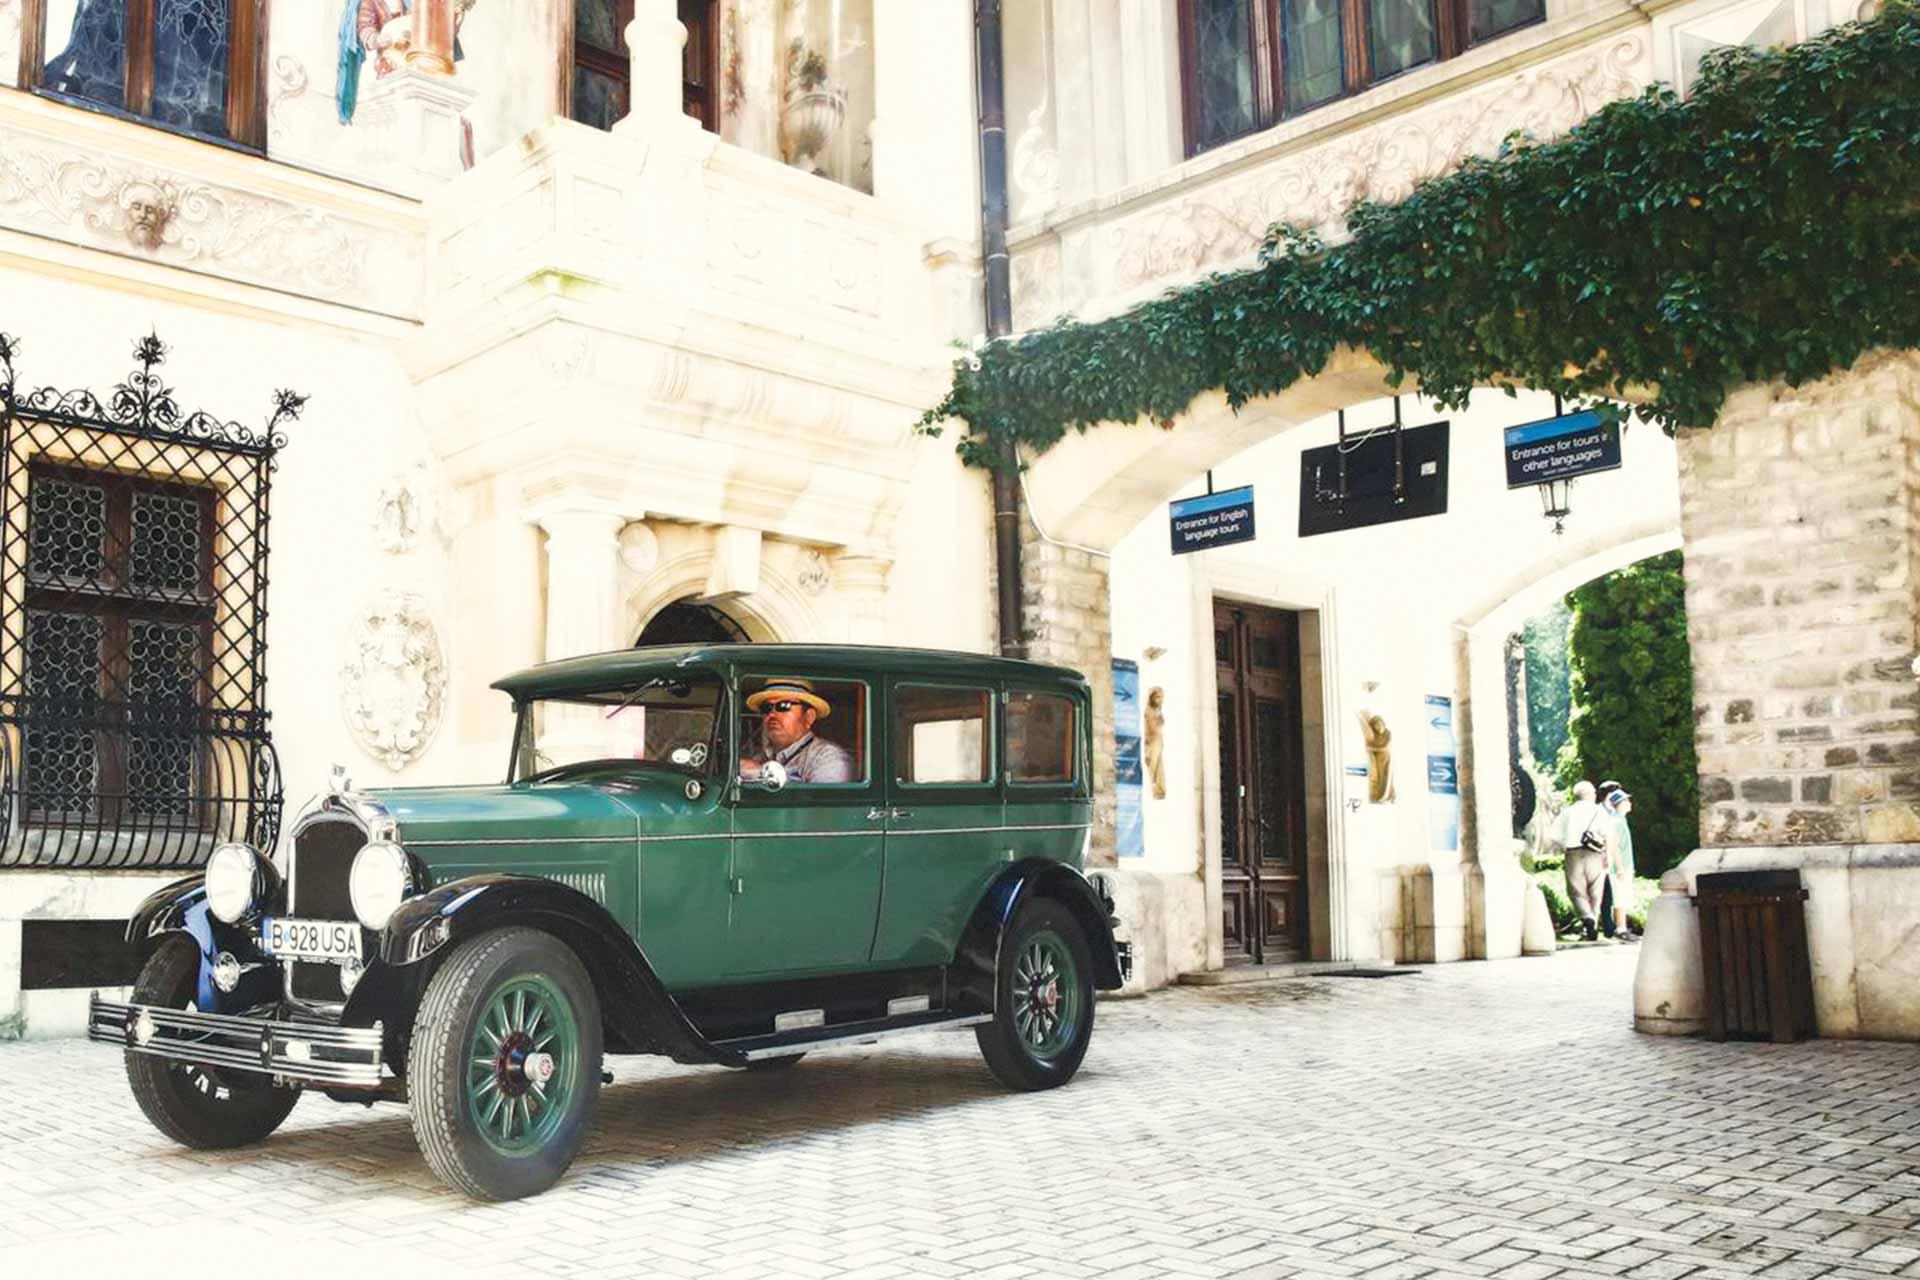 Masina de epoca Dodge 6 de inchiriat pentru nunti